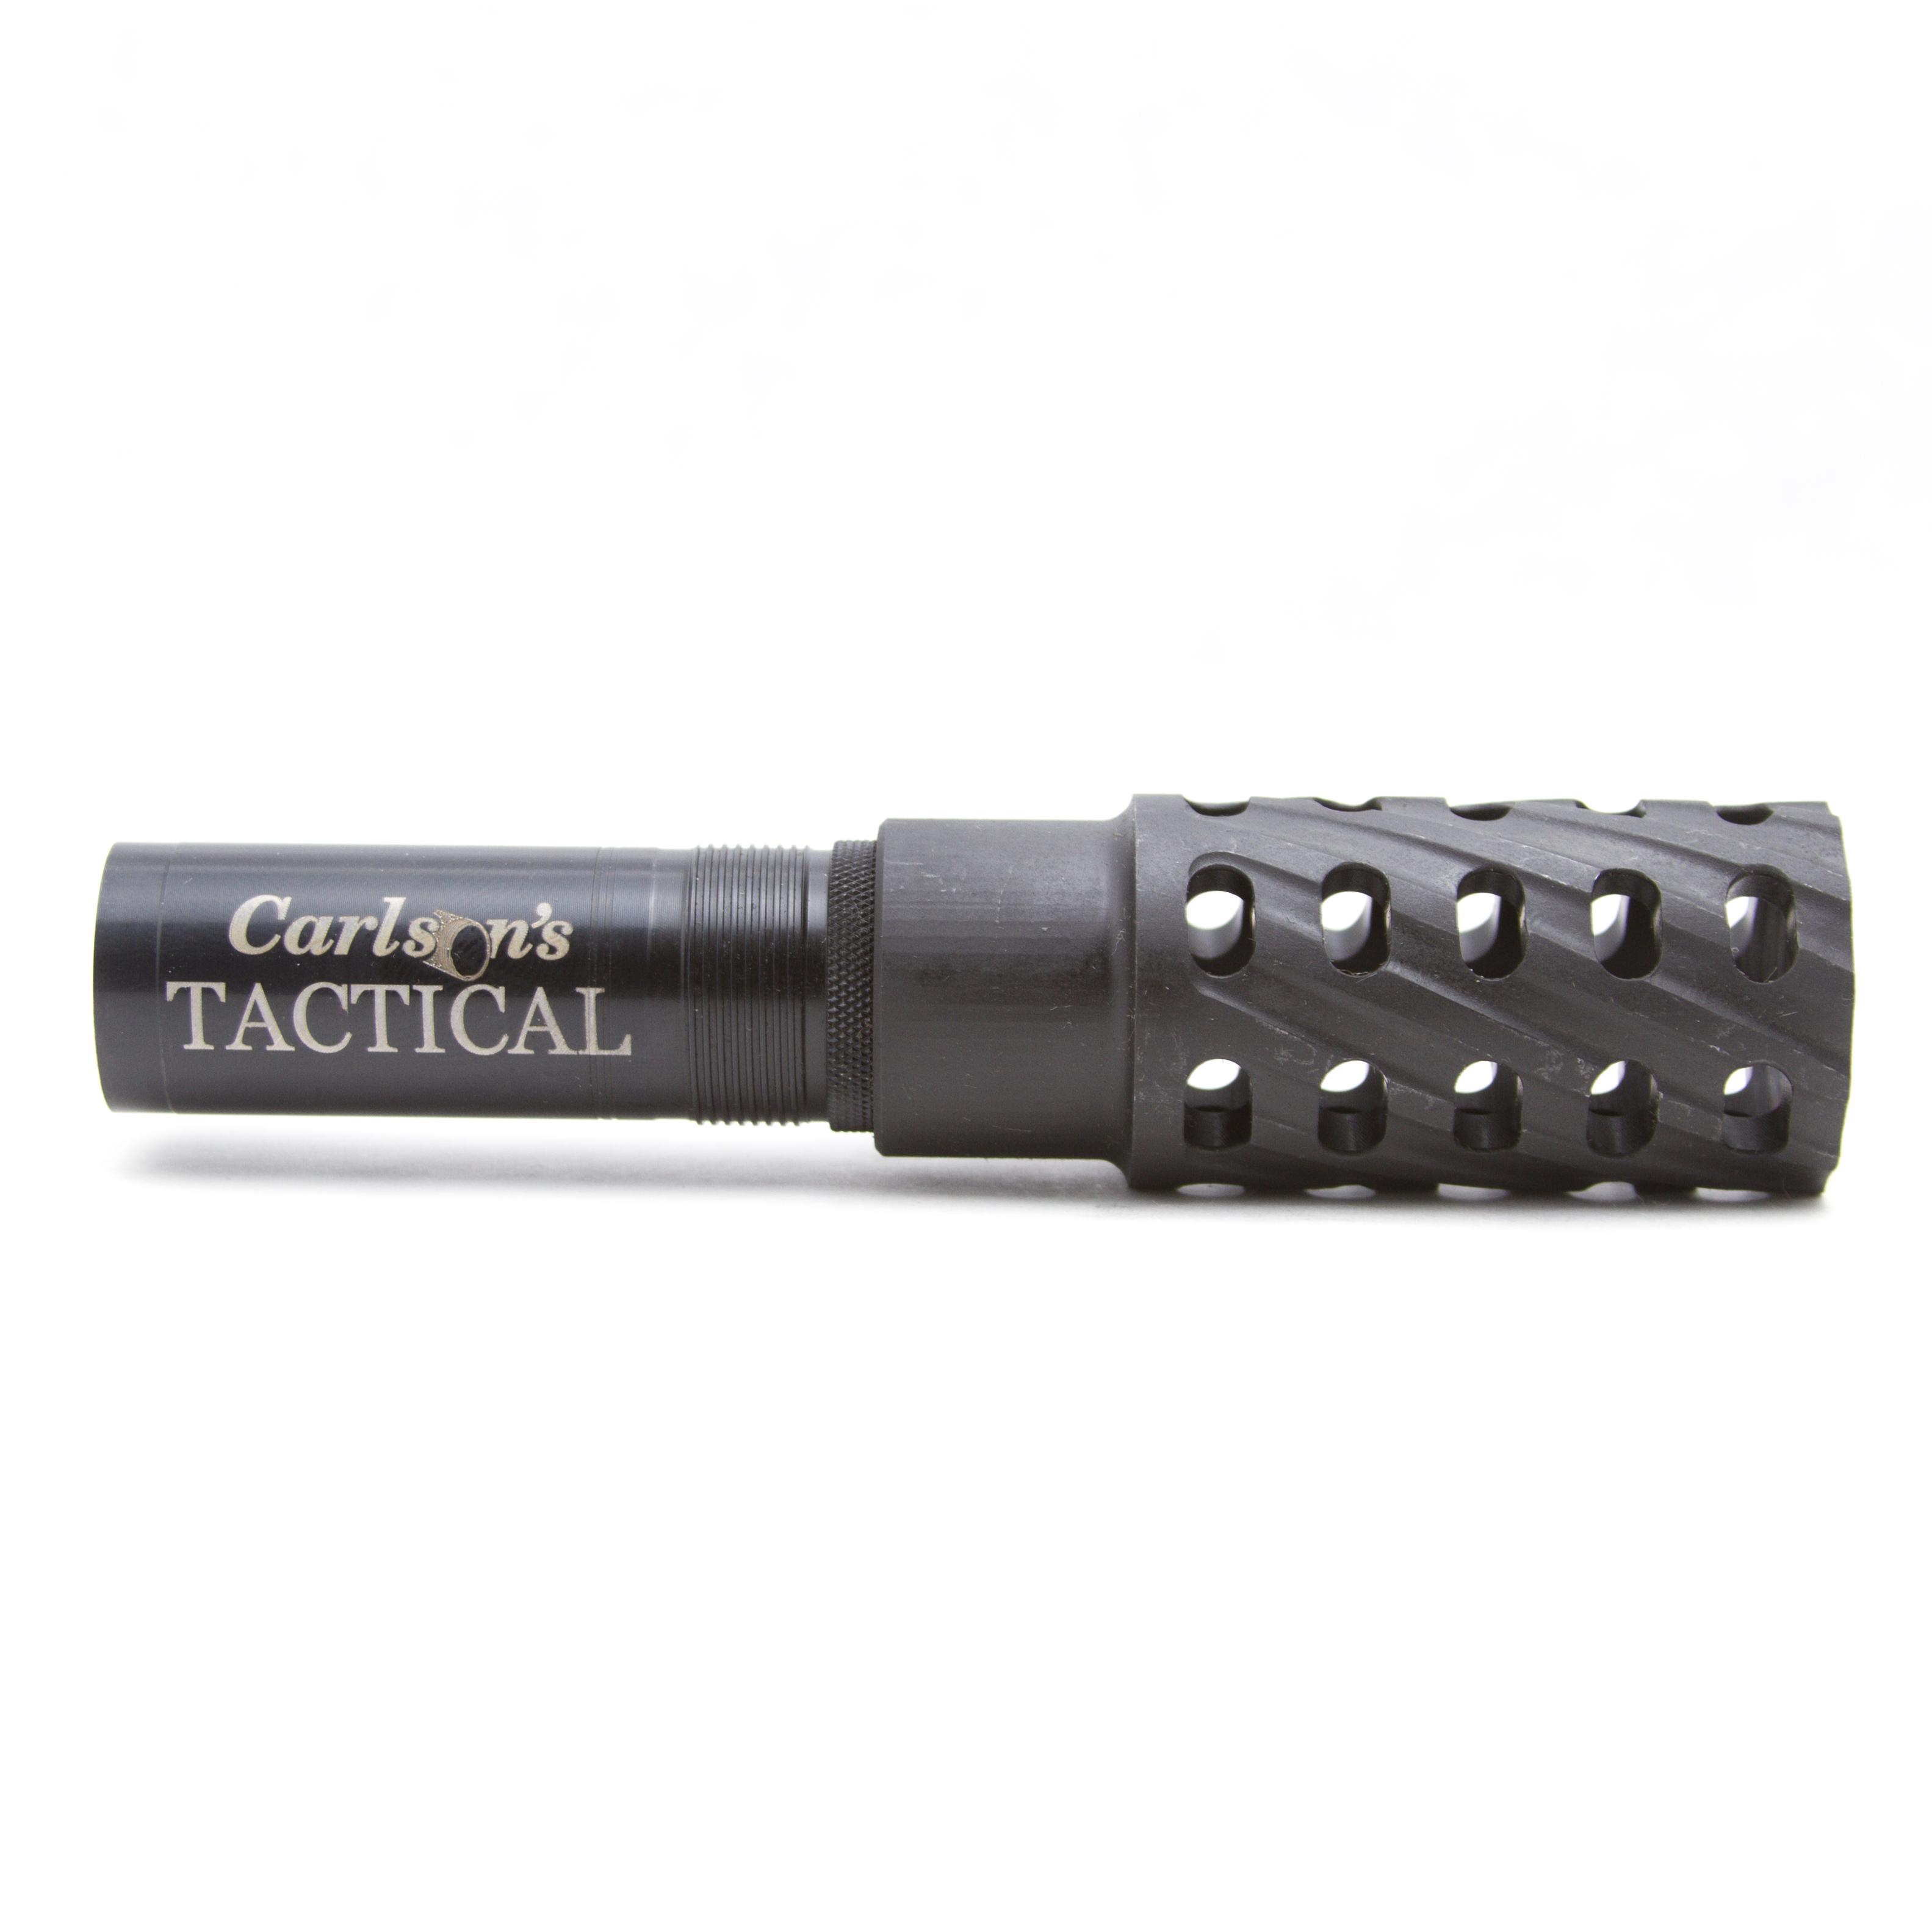 Carlson's Choke Tubes Tactical Muzzle Brake: Ber/Benelli Mobil, Cylinder